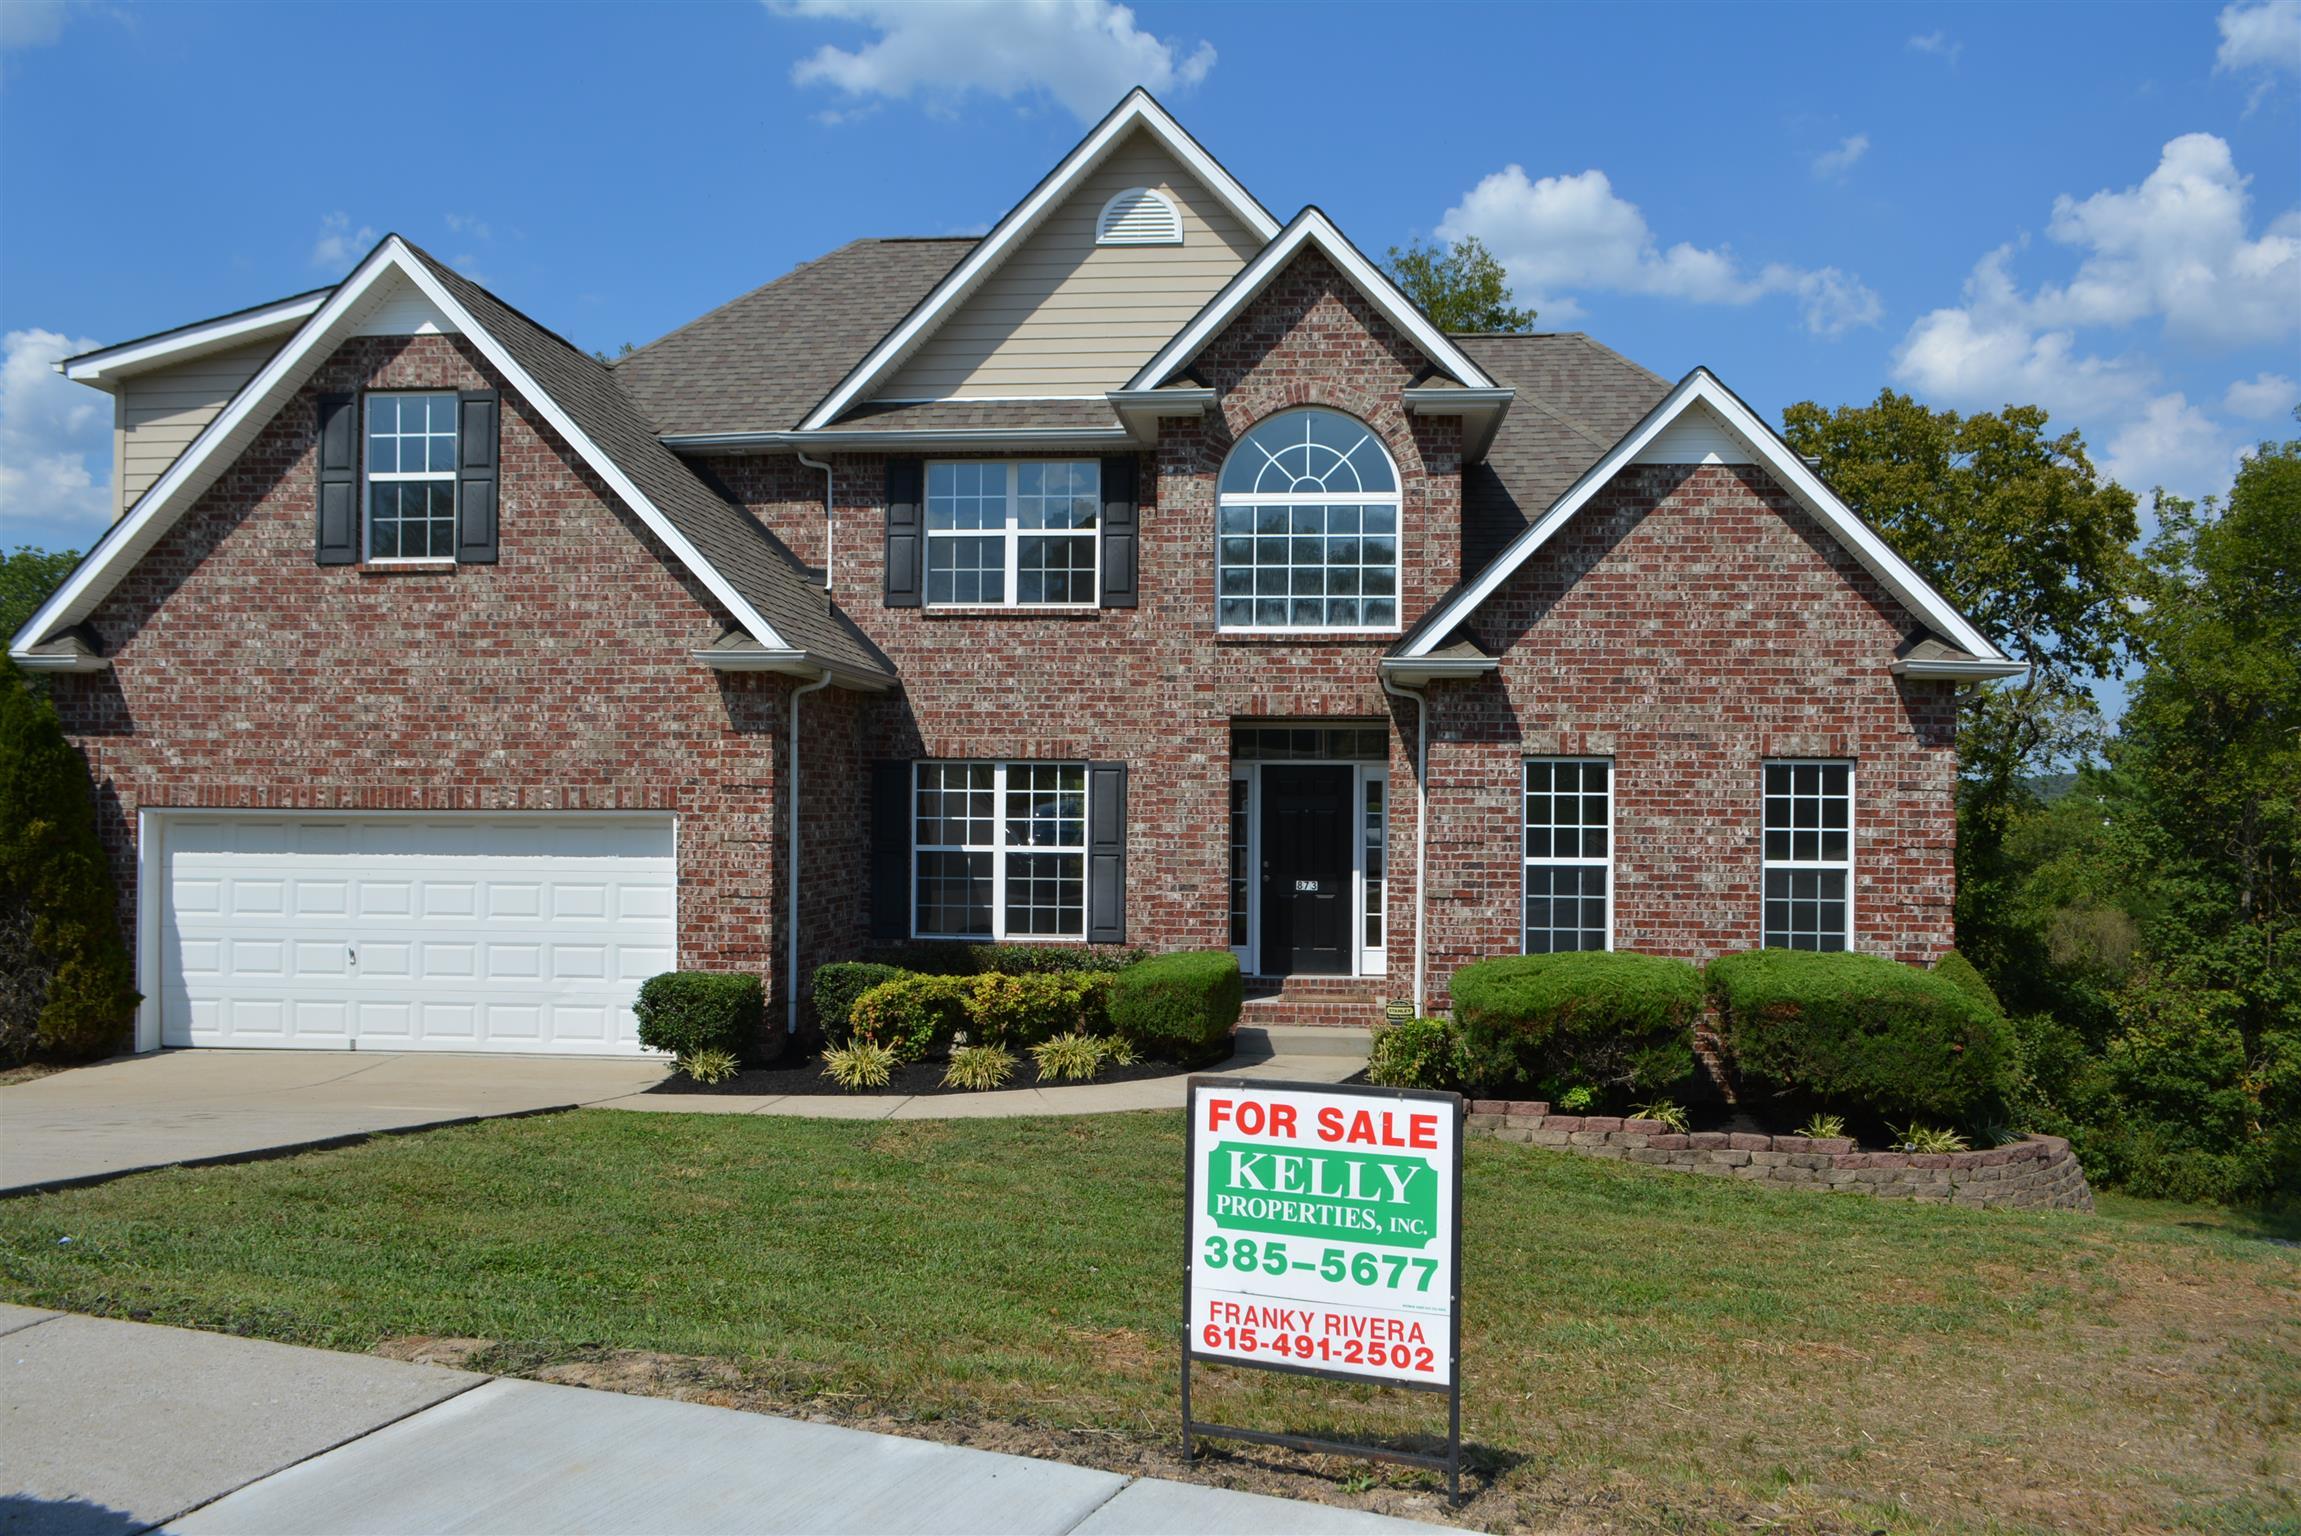 Real Estate in Nashville, TN